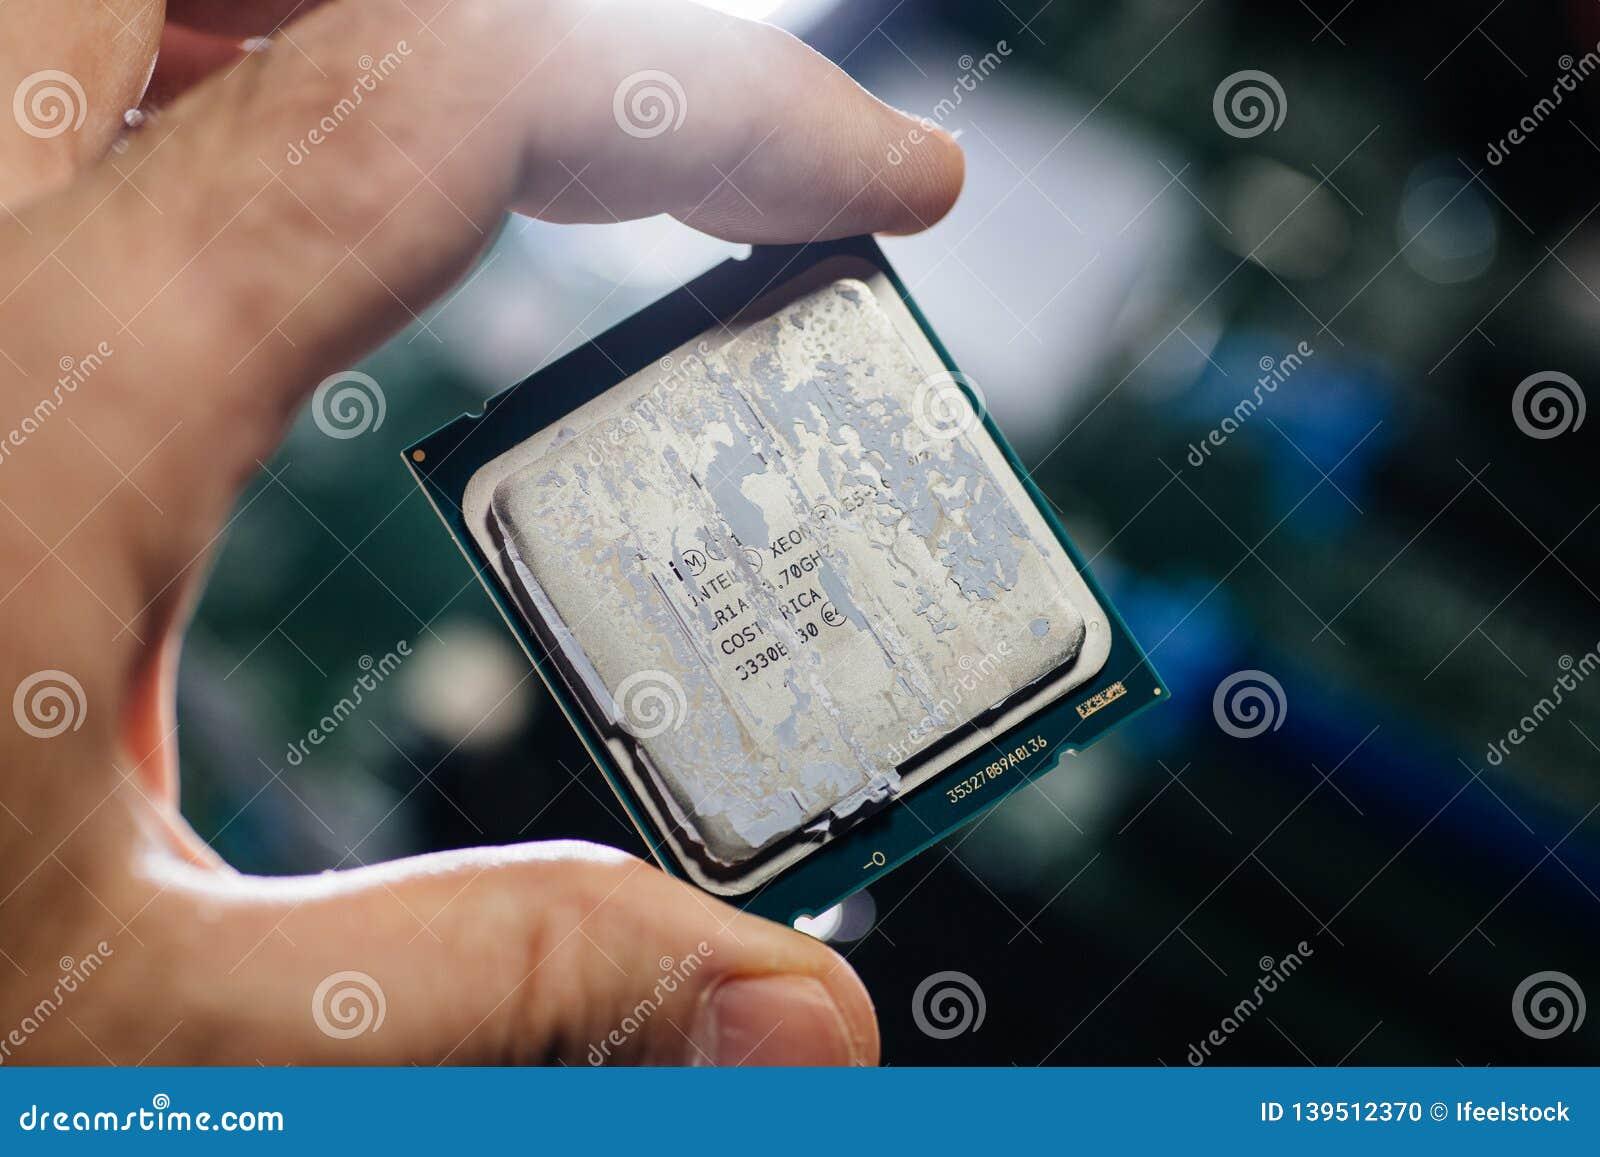 Man Hand Holding Latest Intel Xeon E5-2687w V4 CPU Editorial